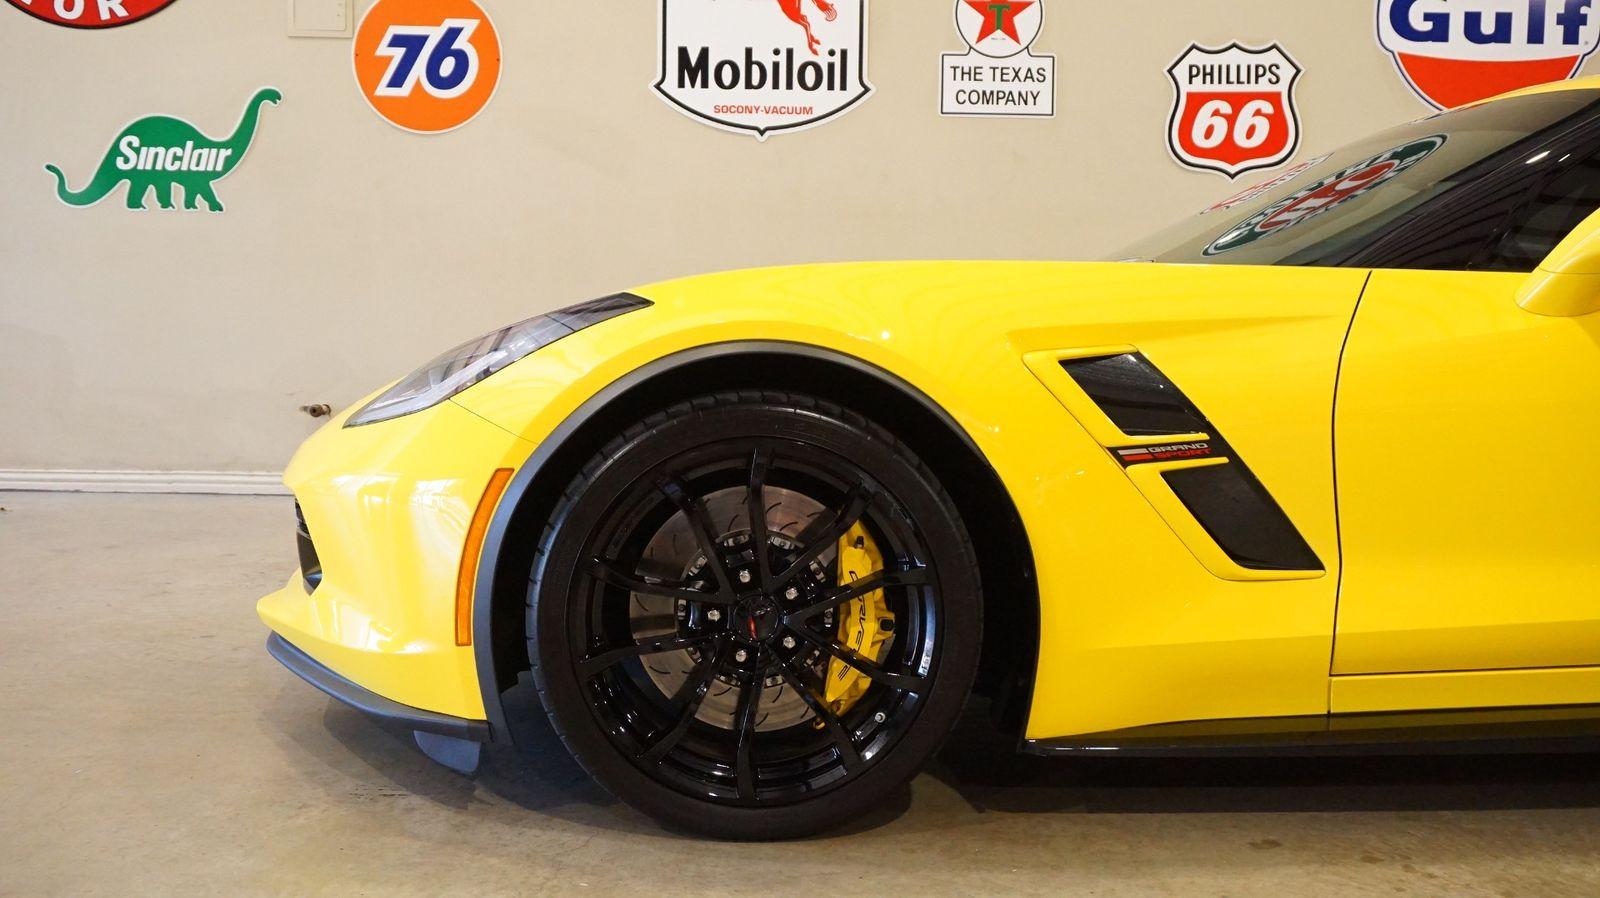 2017 Yellow Chevrolet Corvette Grand Sport 1LT | C7 Corvette Photo 5